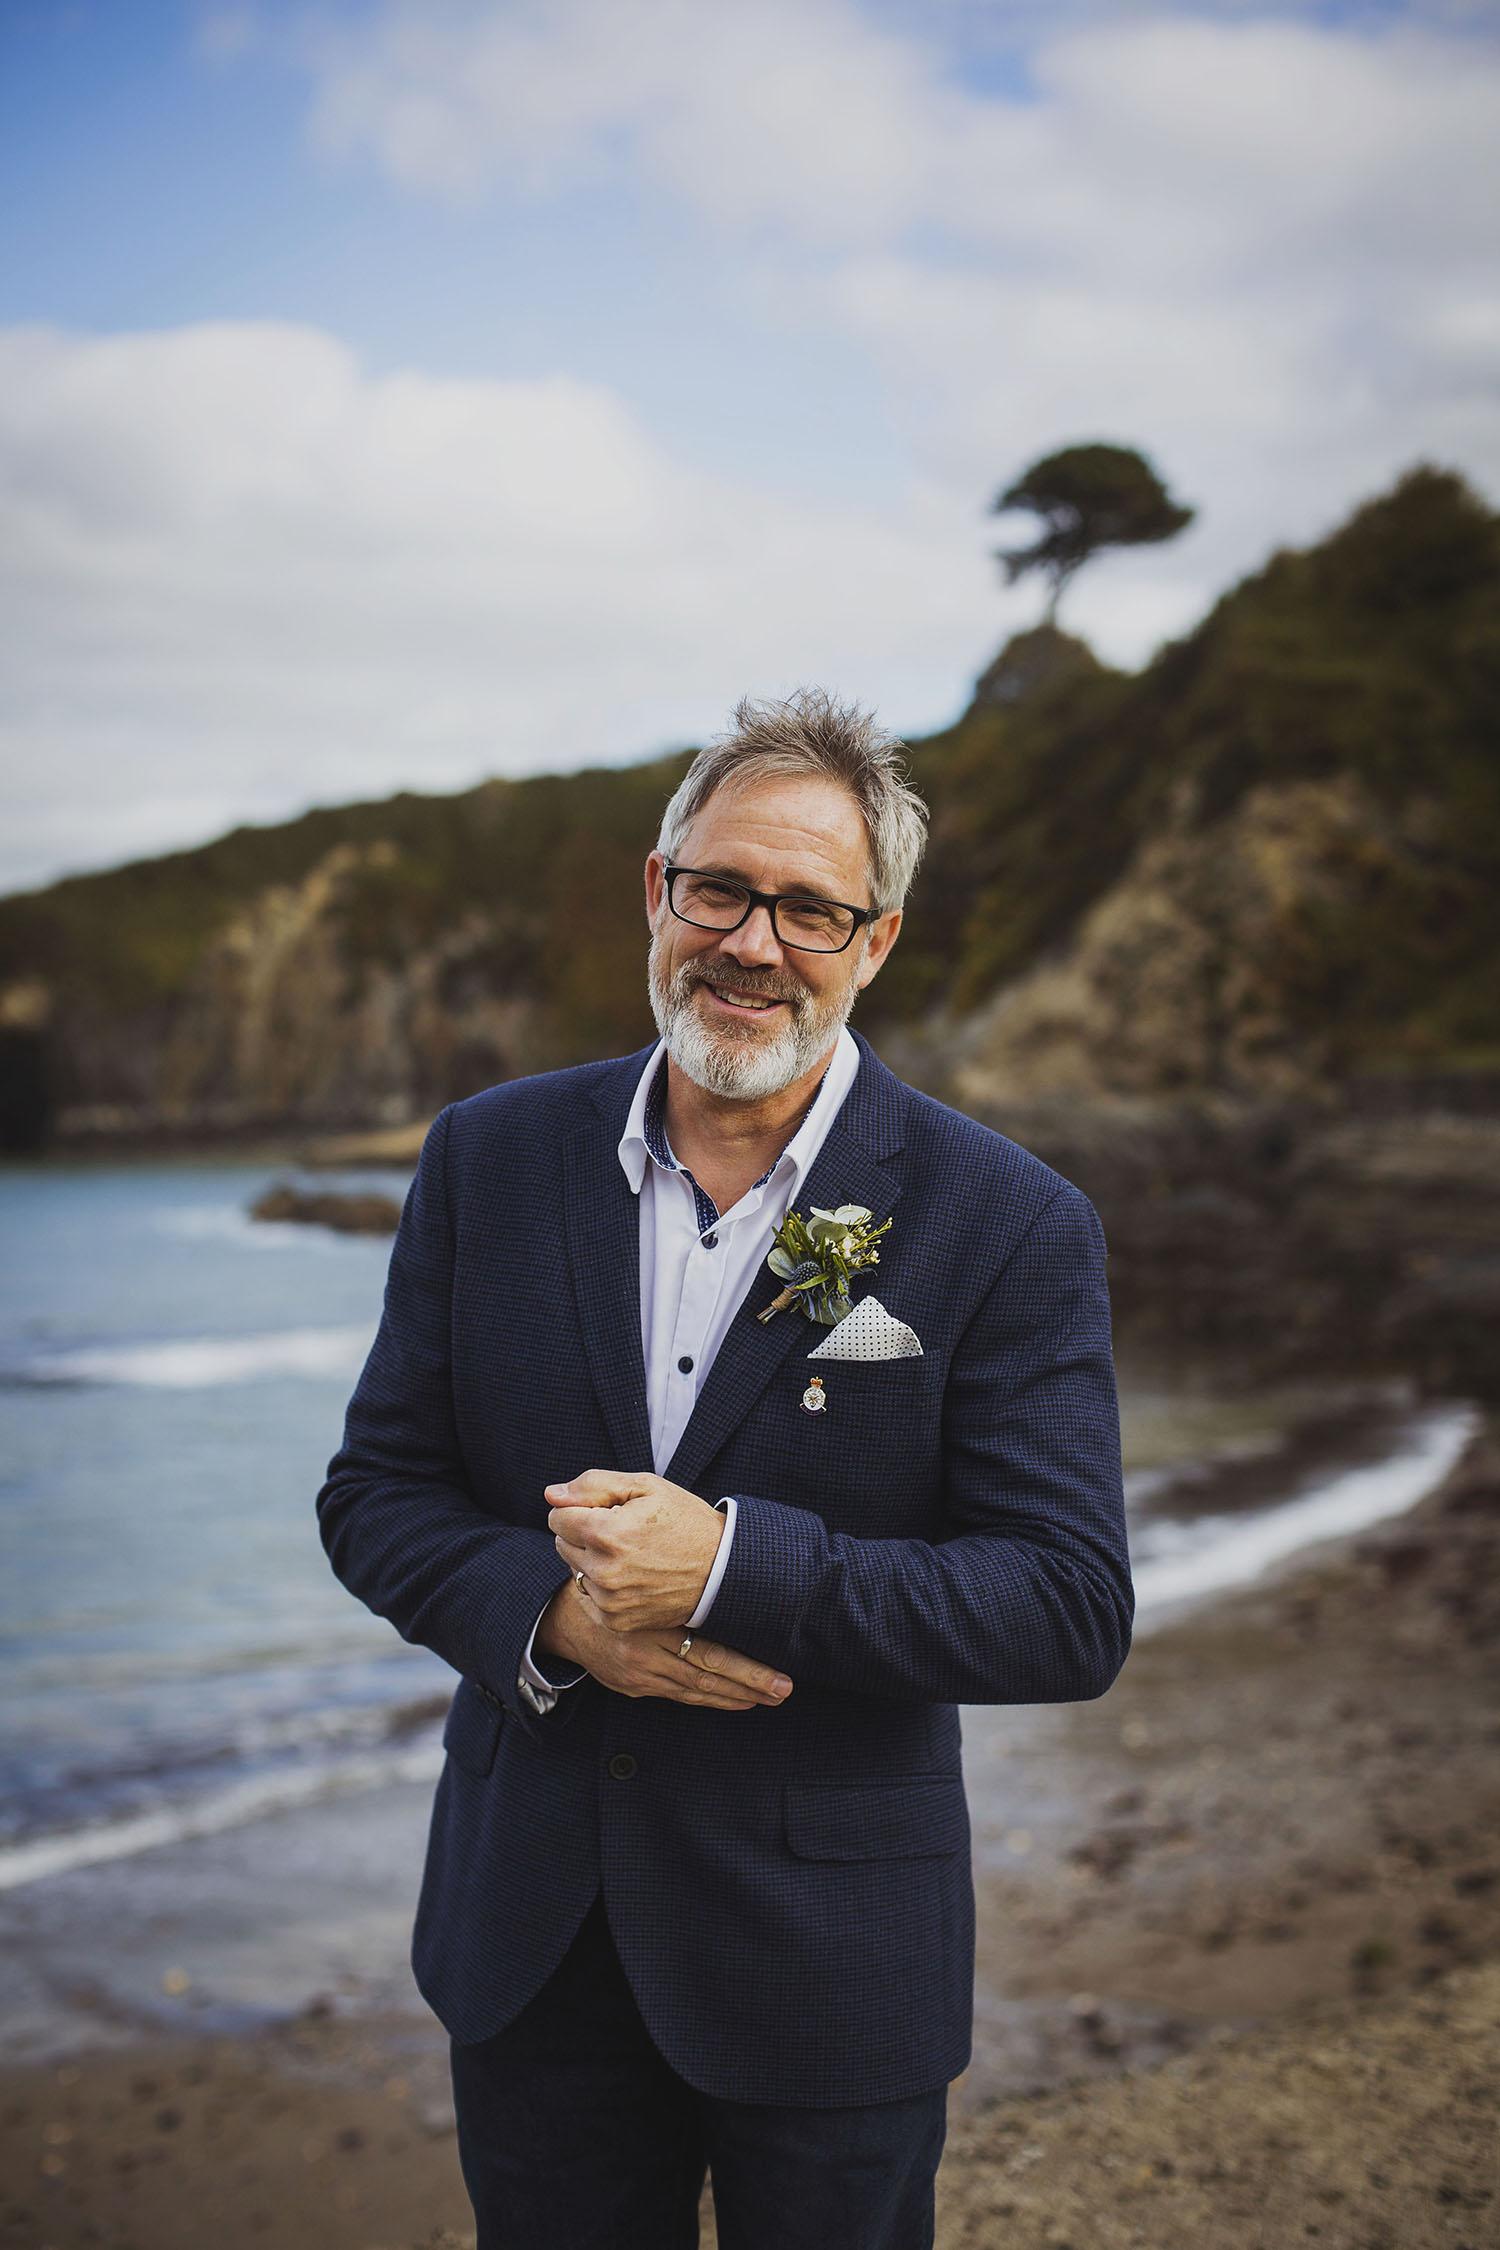 groom with flowers by annabel at beach nantwen wedding pembrokeshire wedding photographer